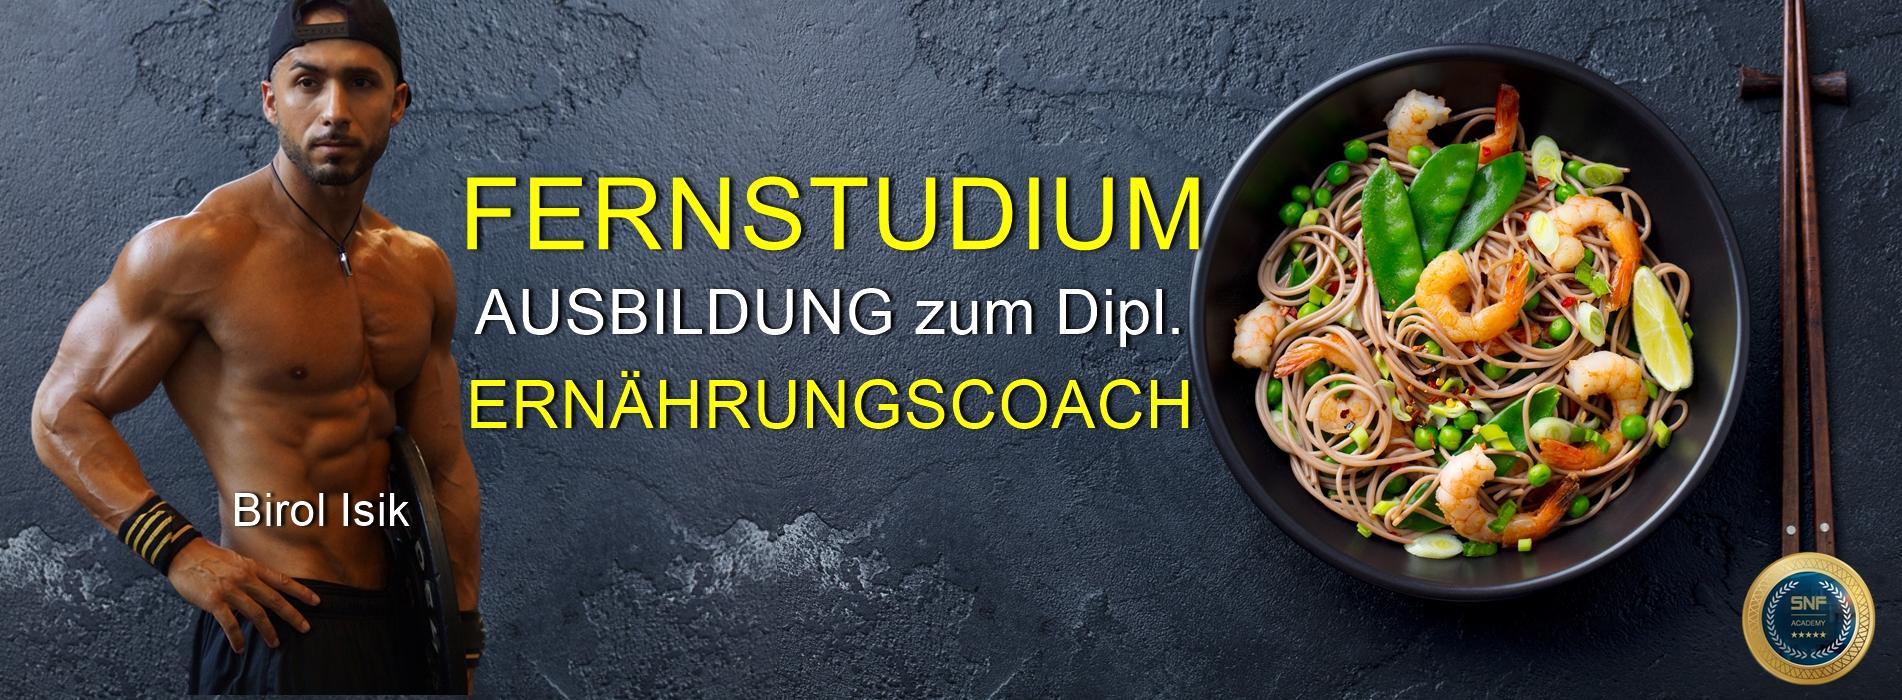 fernstudium_ernährungscoach_schweiz